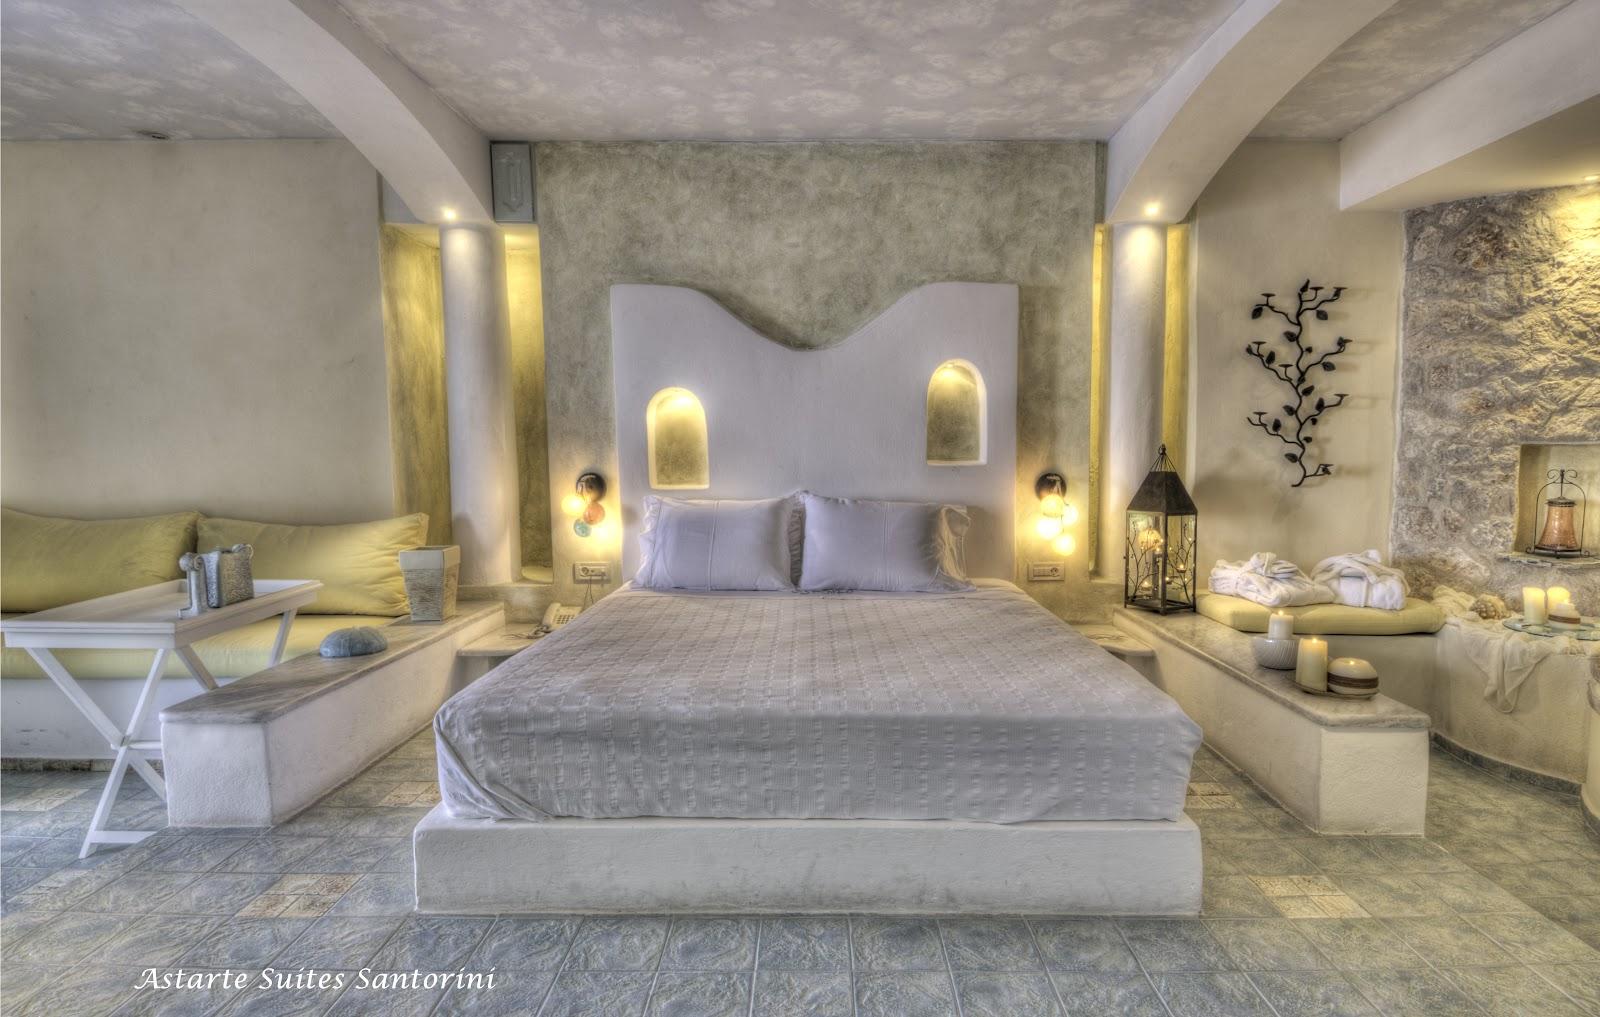 Astarte Suites In Santorini Island